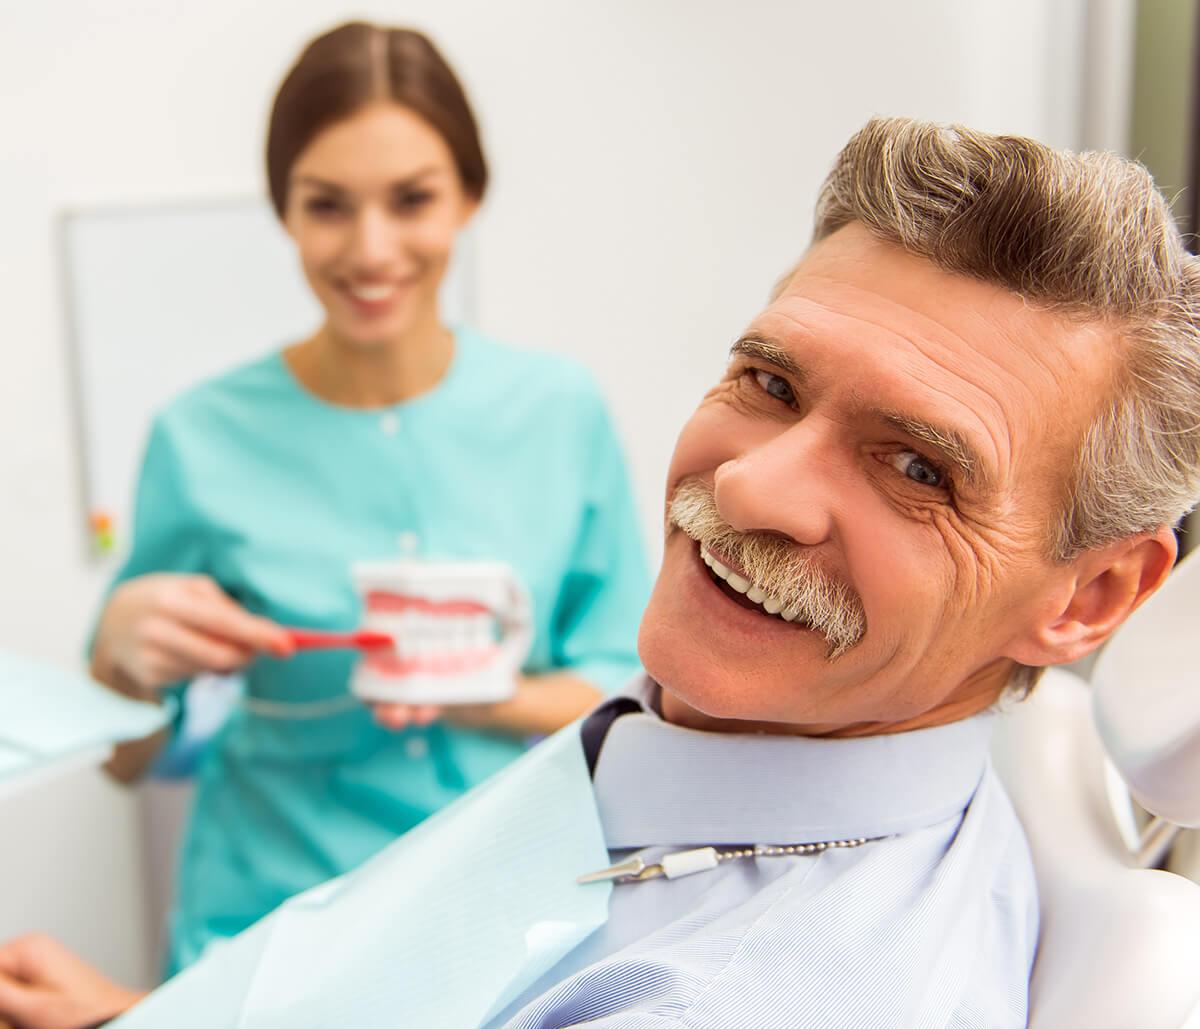 Immediate Dentures Service at Pasadena Prosthodontics in Pasadena, Ca Area